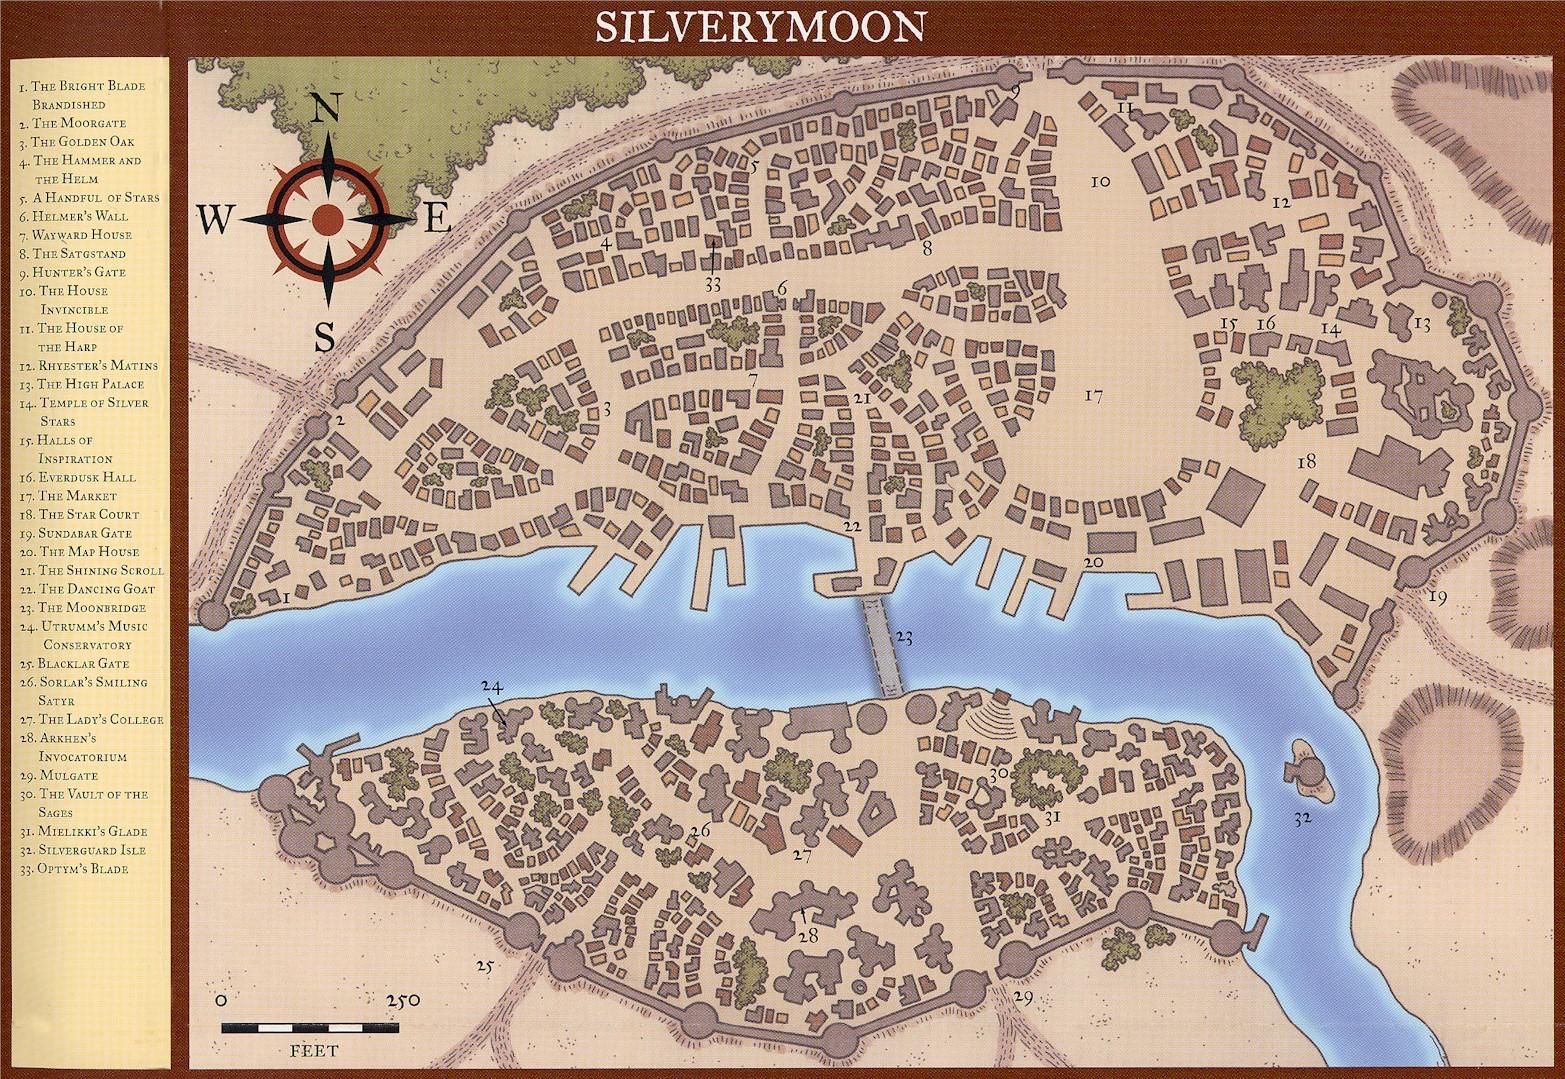 Silverymoon - Dungeons & Dragons